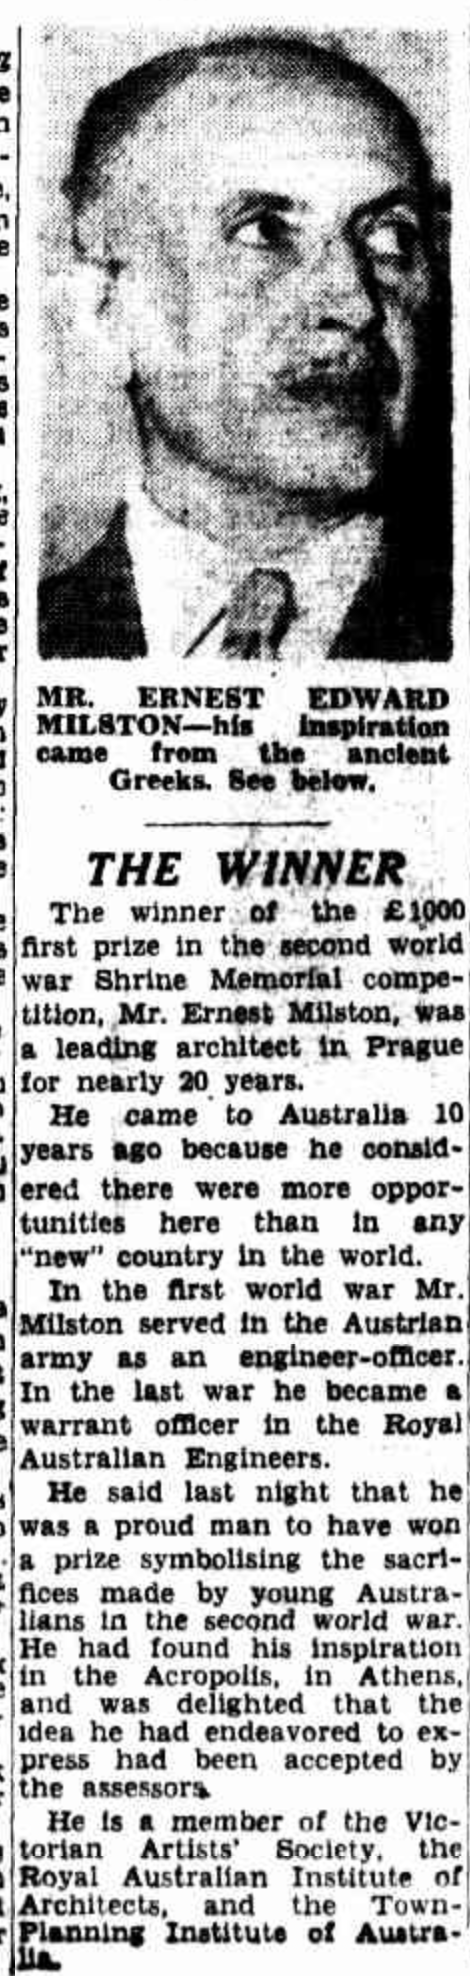 Milston The Age 18 Feb 1950 pg 2